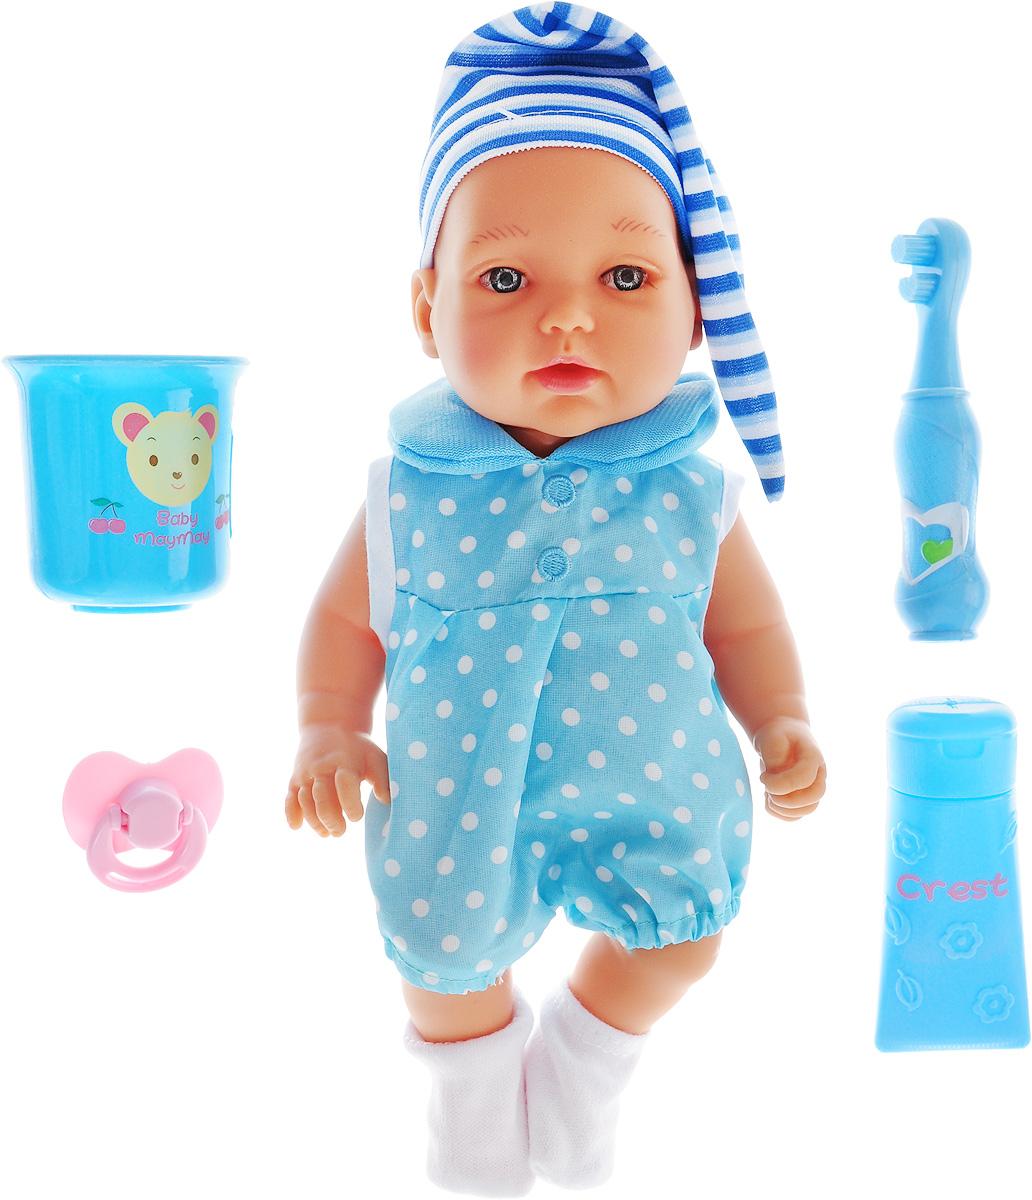 S+S Toys Пупс с аксессуарами цвет голубой 200099748 кукла s s toys 1025 doll